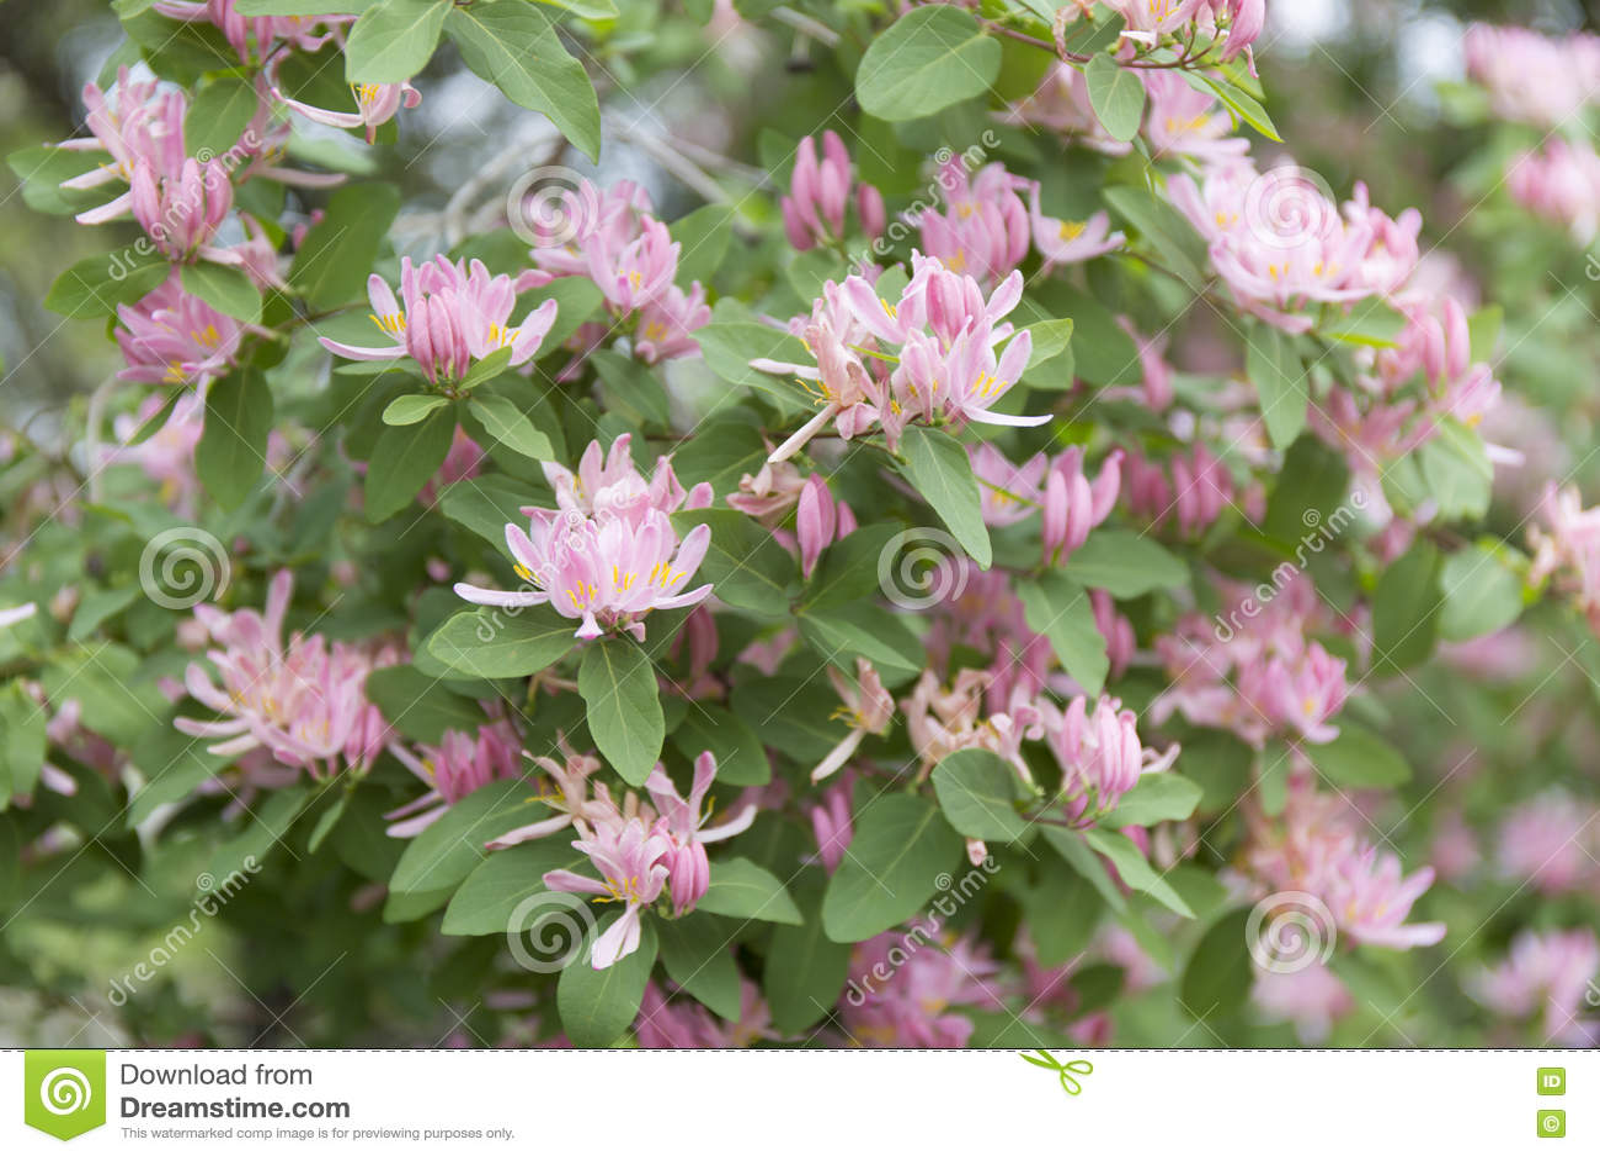 Lonicera tatarica pink flowers background english name tatarian lonicera tatarica pink flowers background english name tatarian honeysuckle mightylinksfo